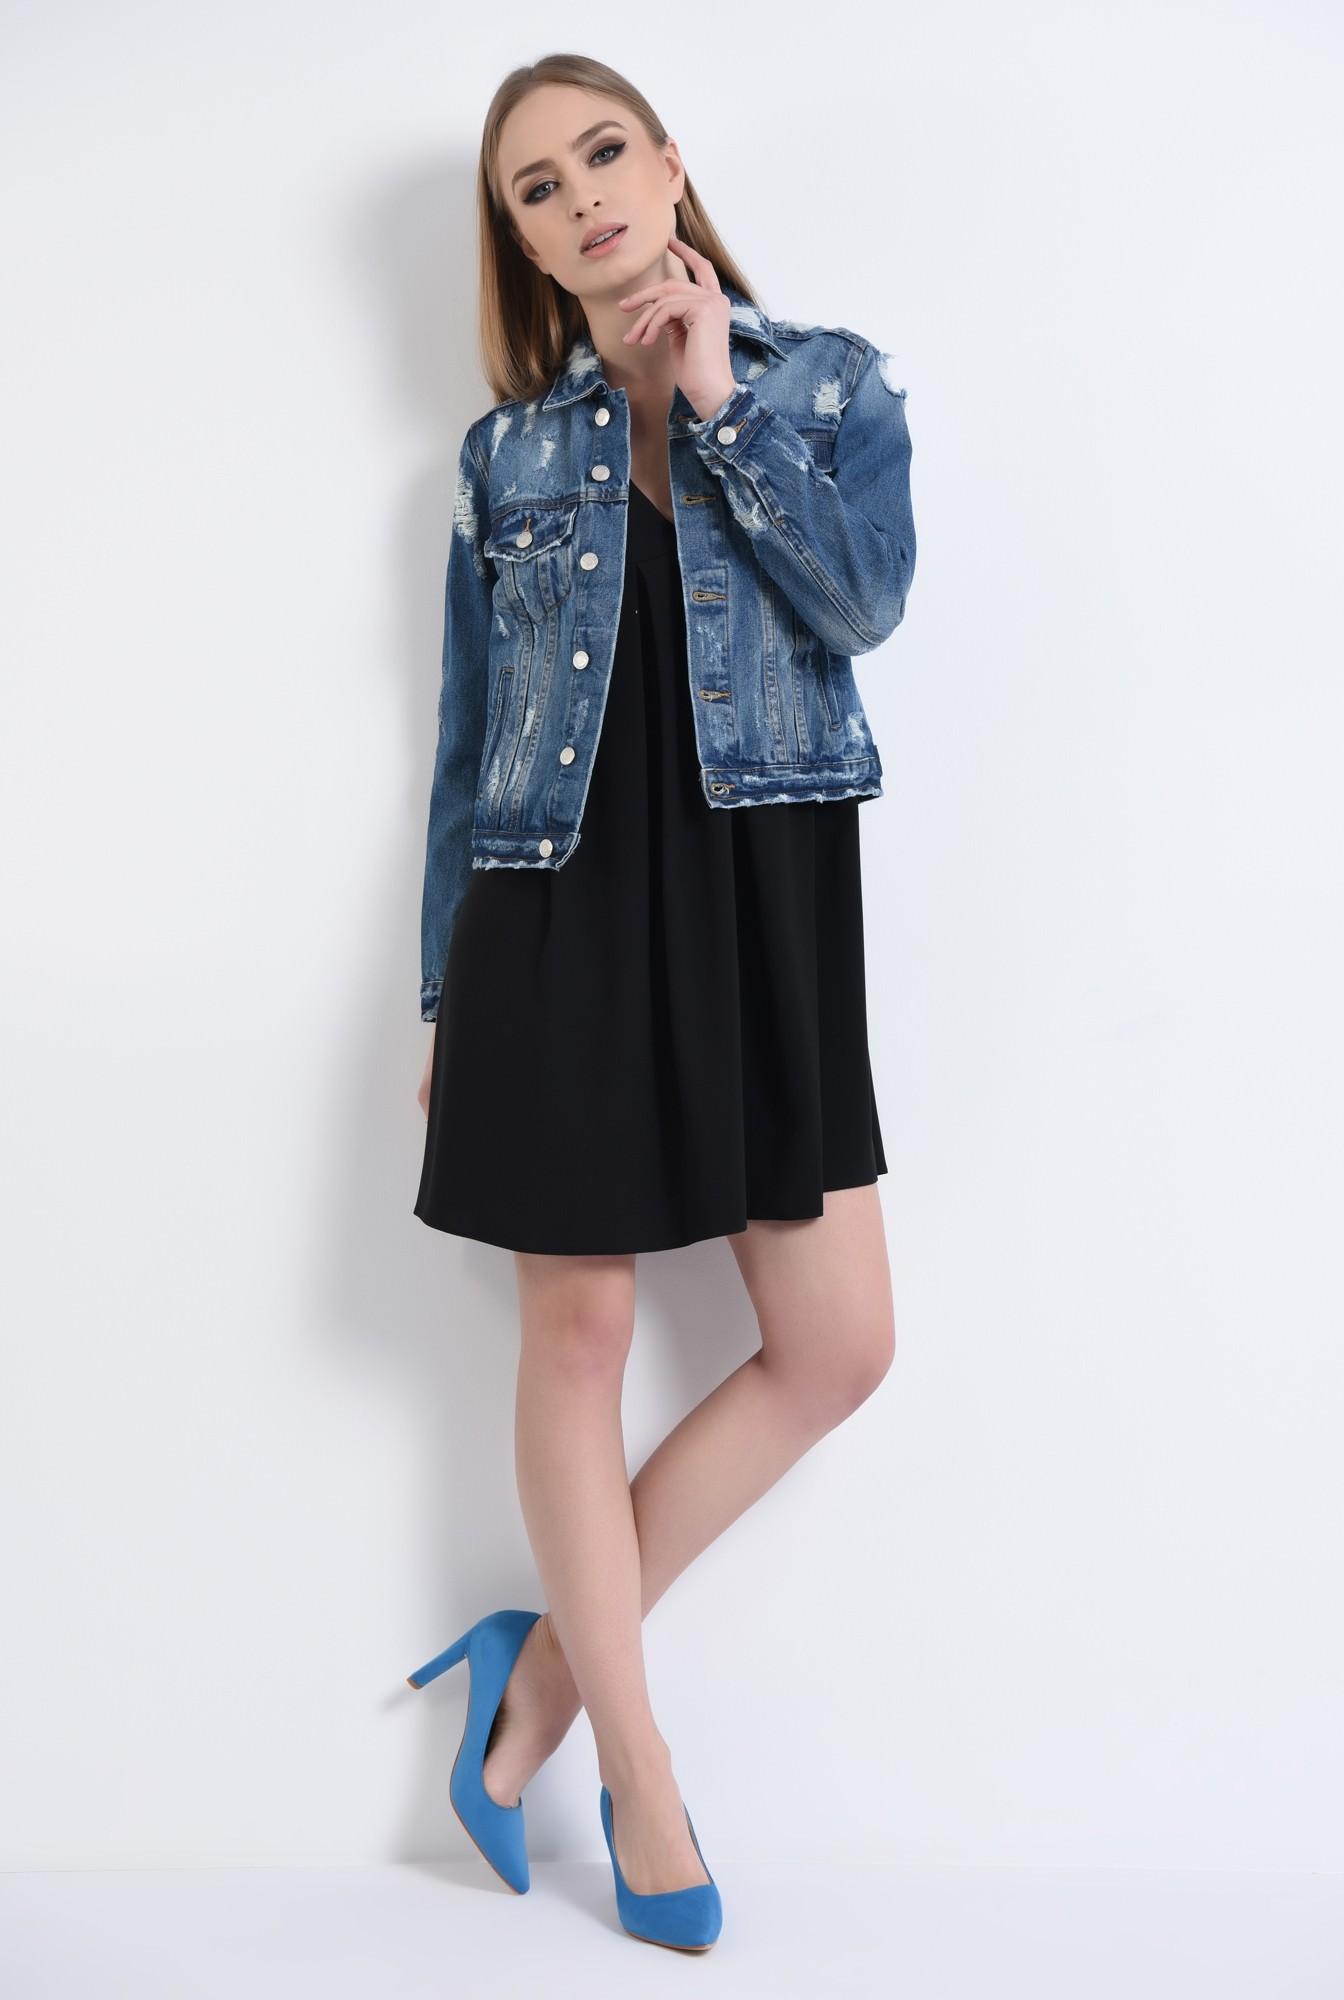 4 - pantofi casual, bleu, toc drept, piele intoarsa